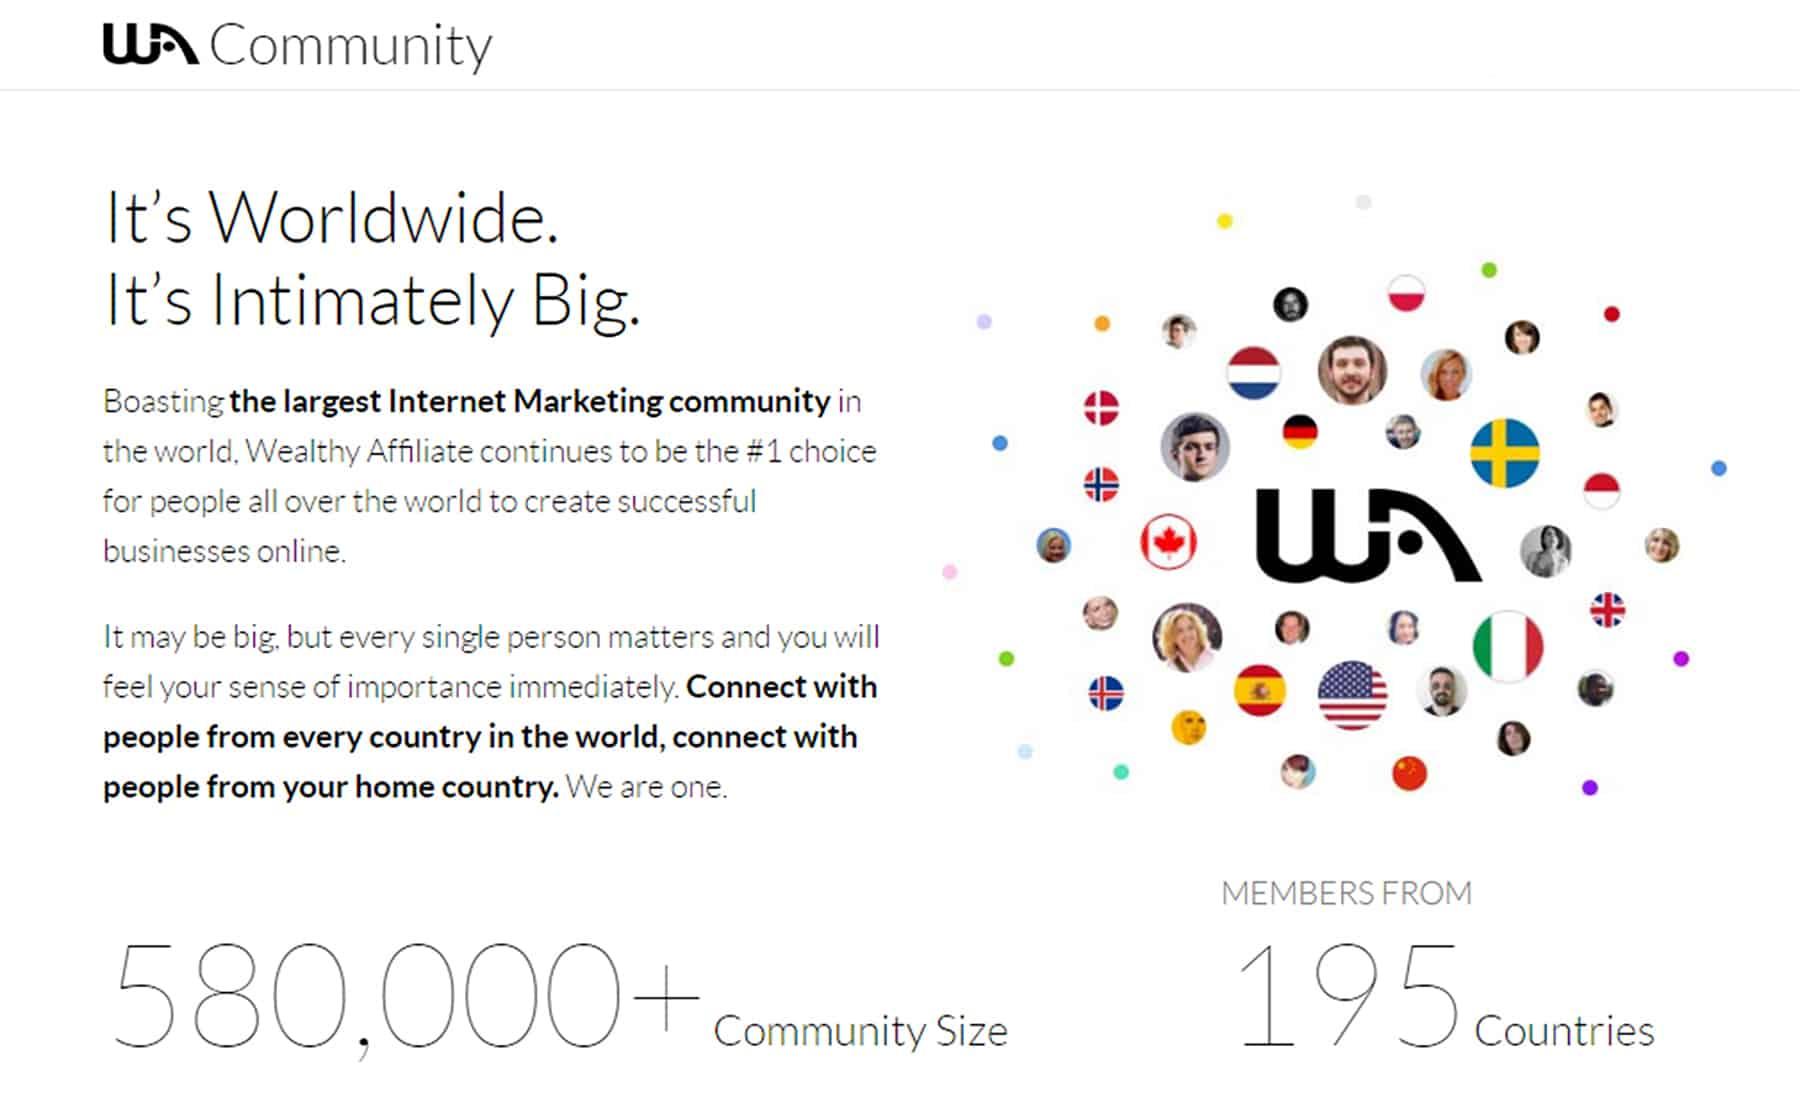 wealthy-affiliate-community